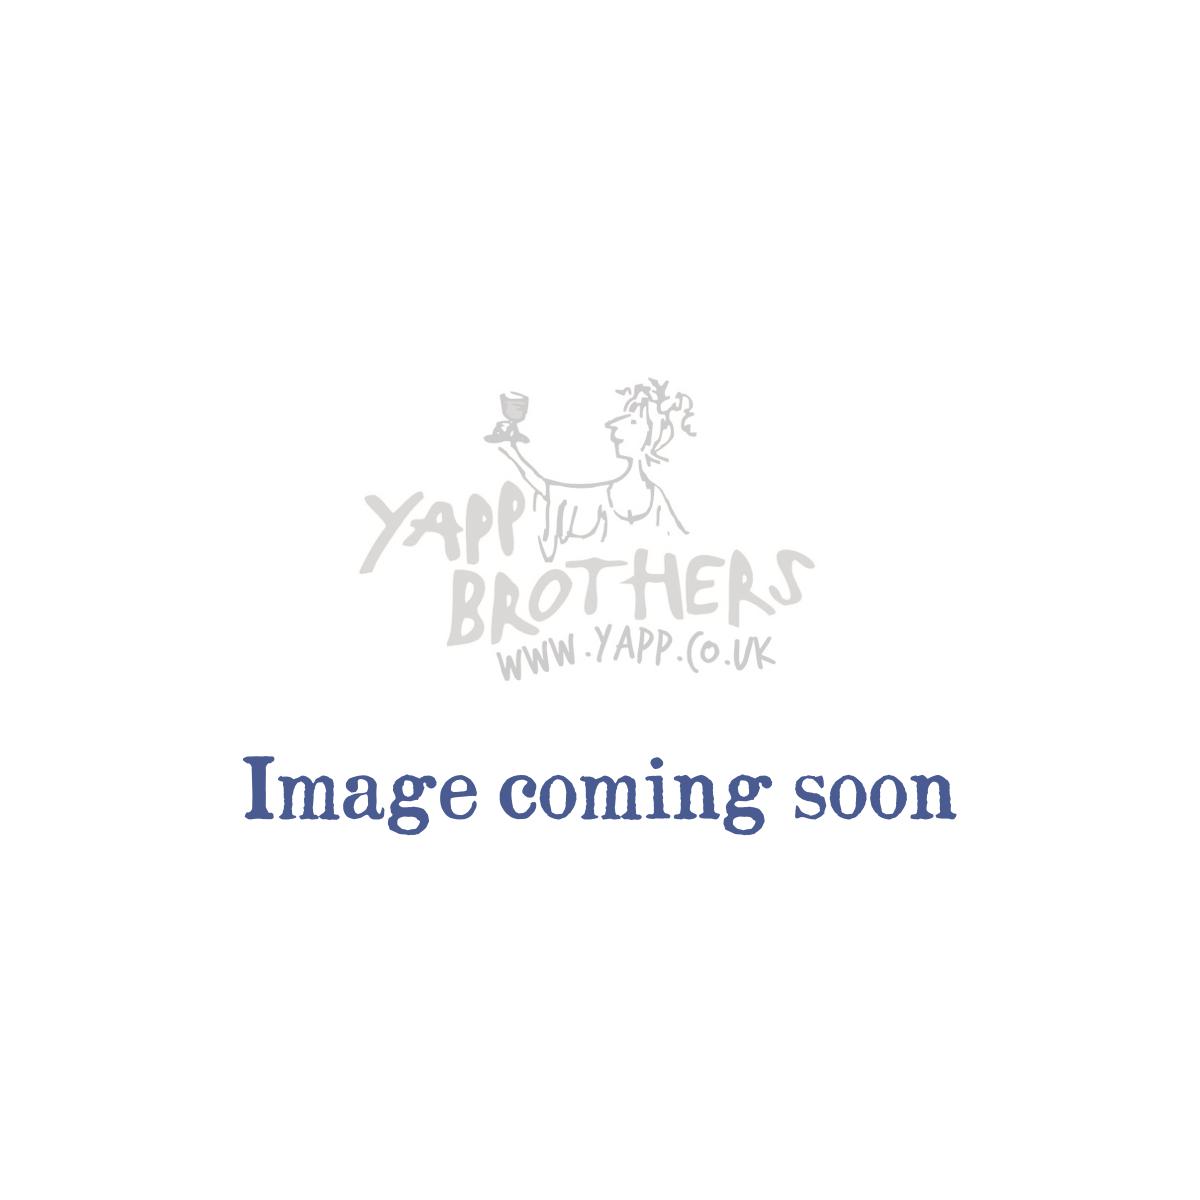 Chablis: Domaine Christophe Camu 'Beauroy' Premier Cru 2019 - Bottle